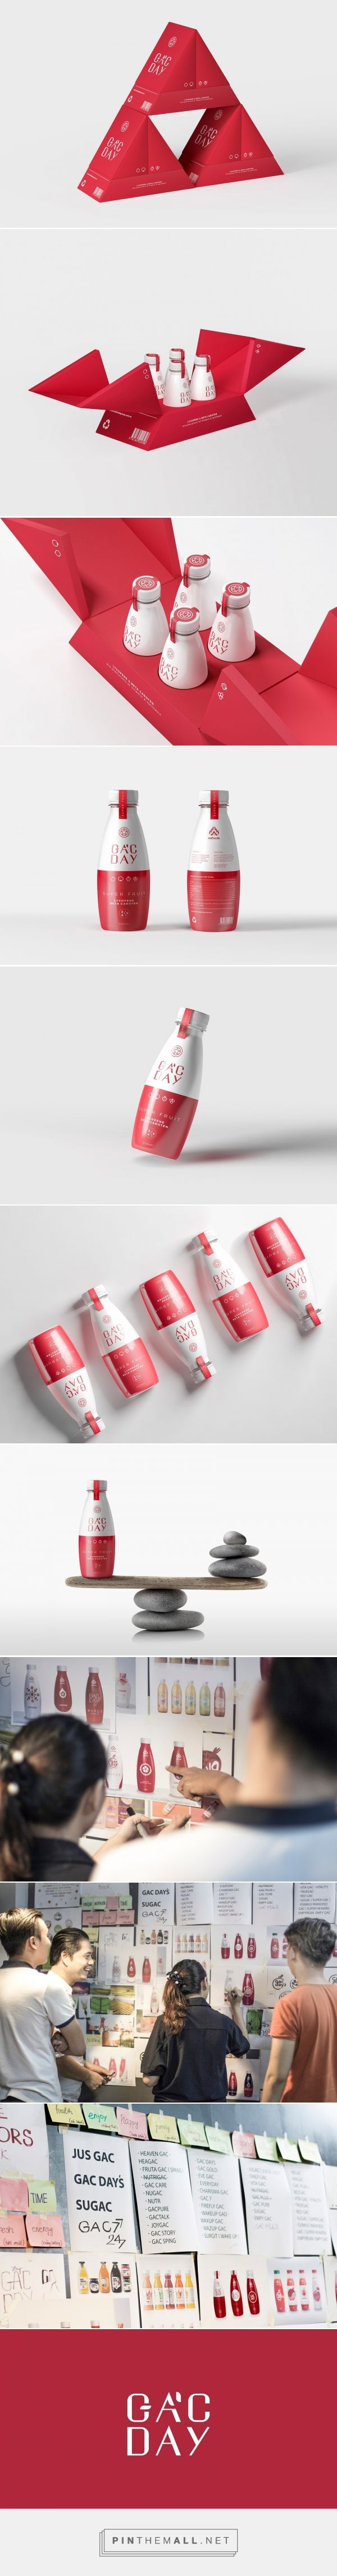 Gac Day nutrition drink packaging design by Bratus Agency - https://www.packagingoftheworld.com/2018/03/gac-day.html